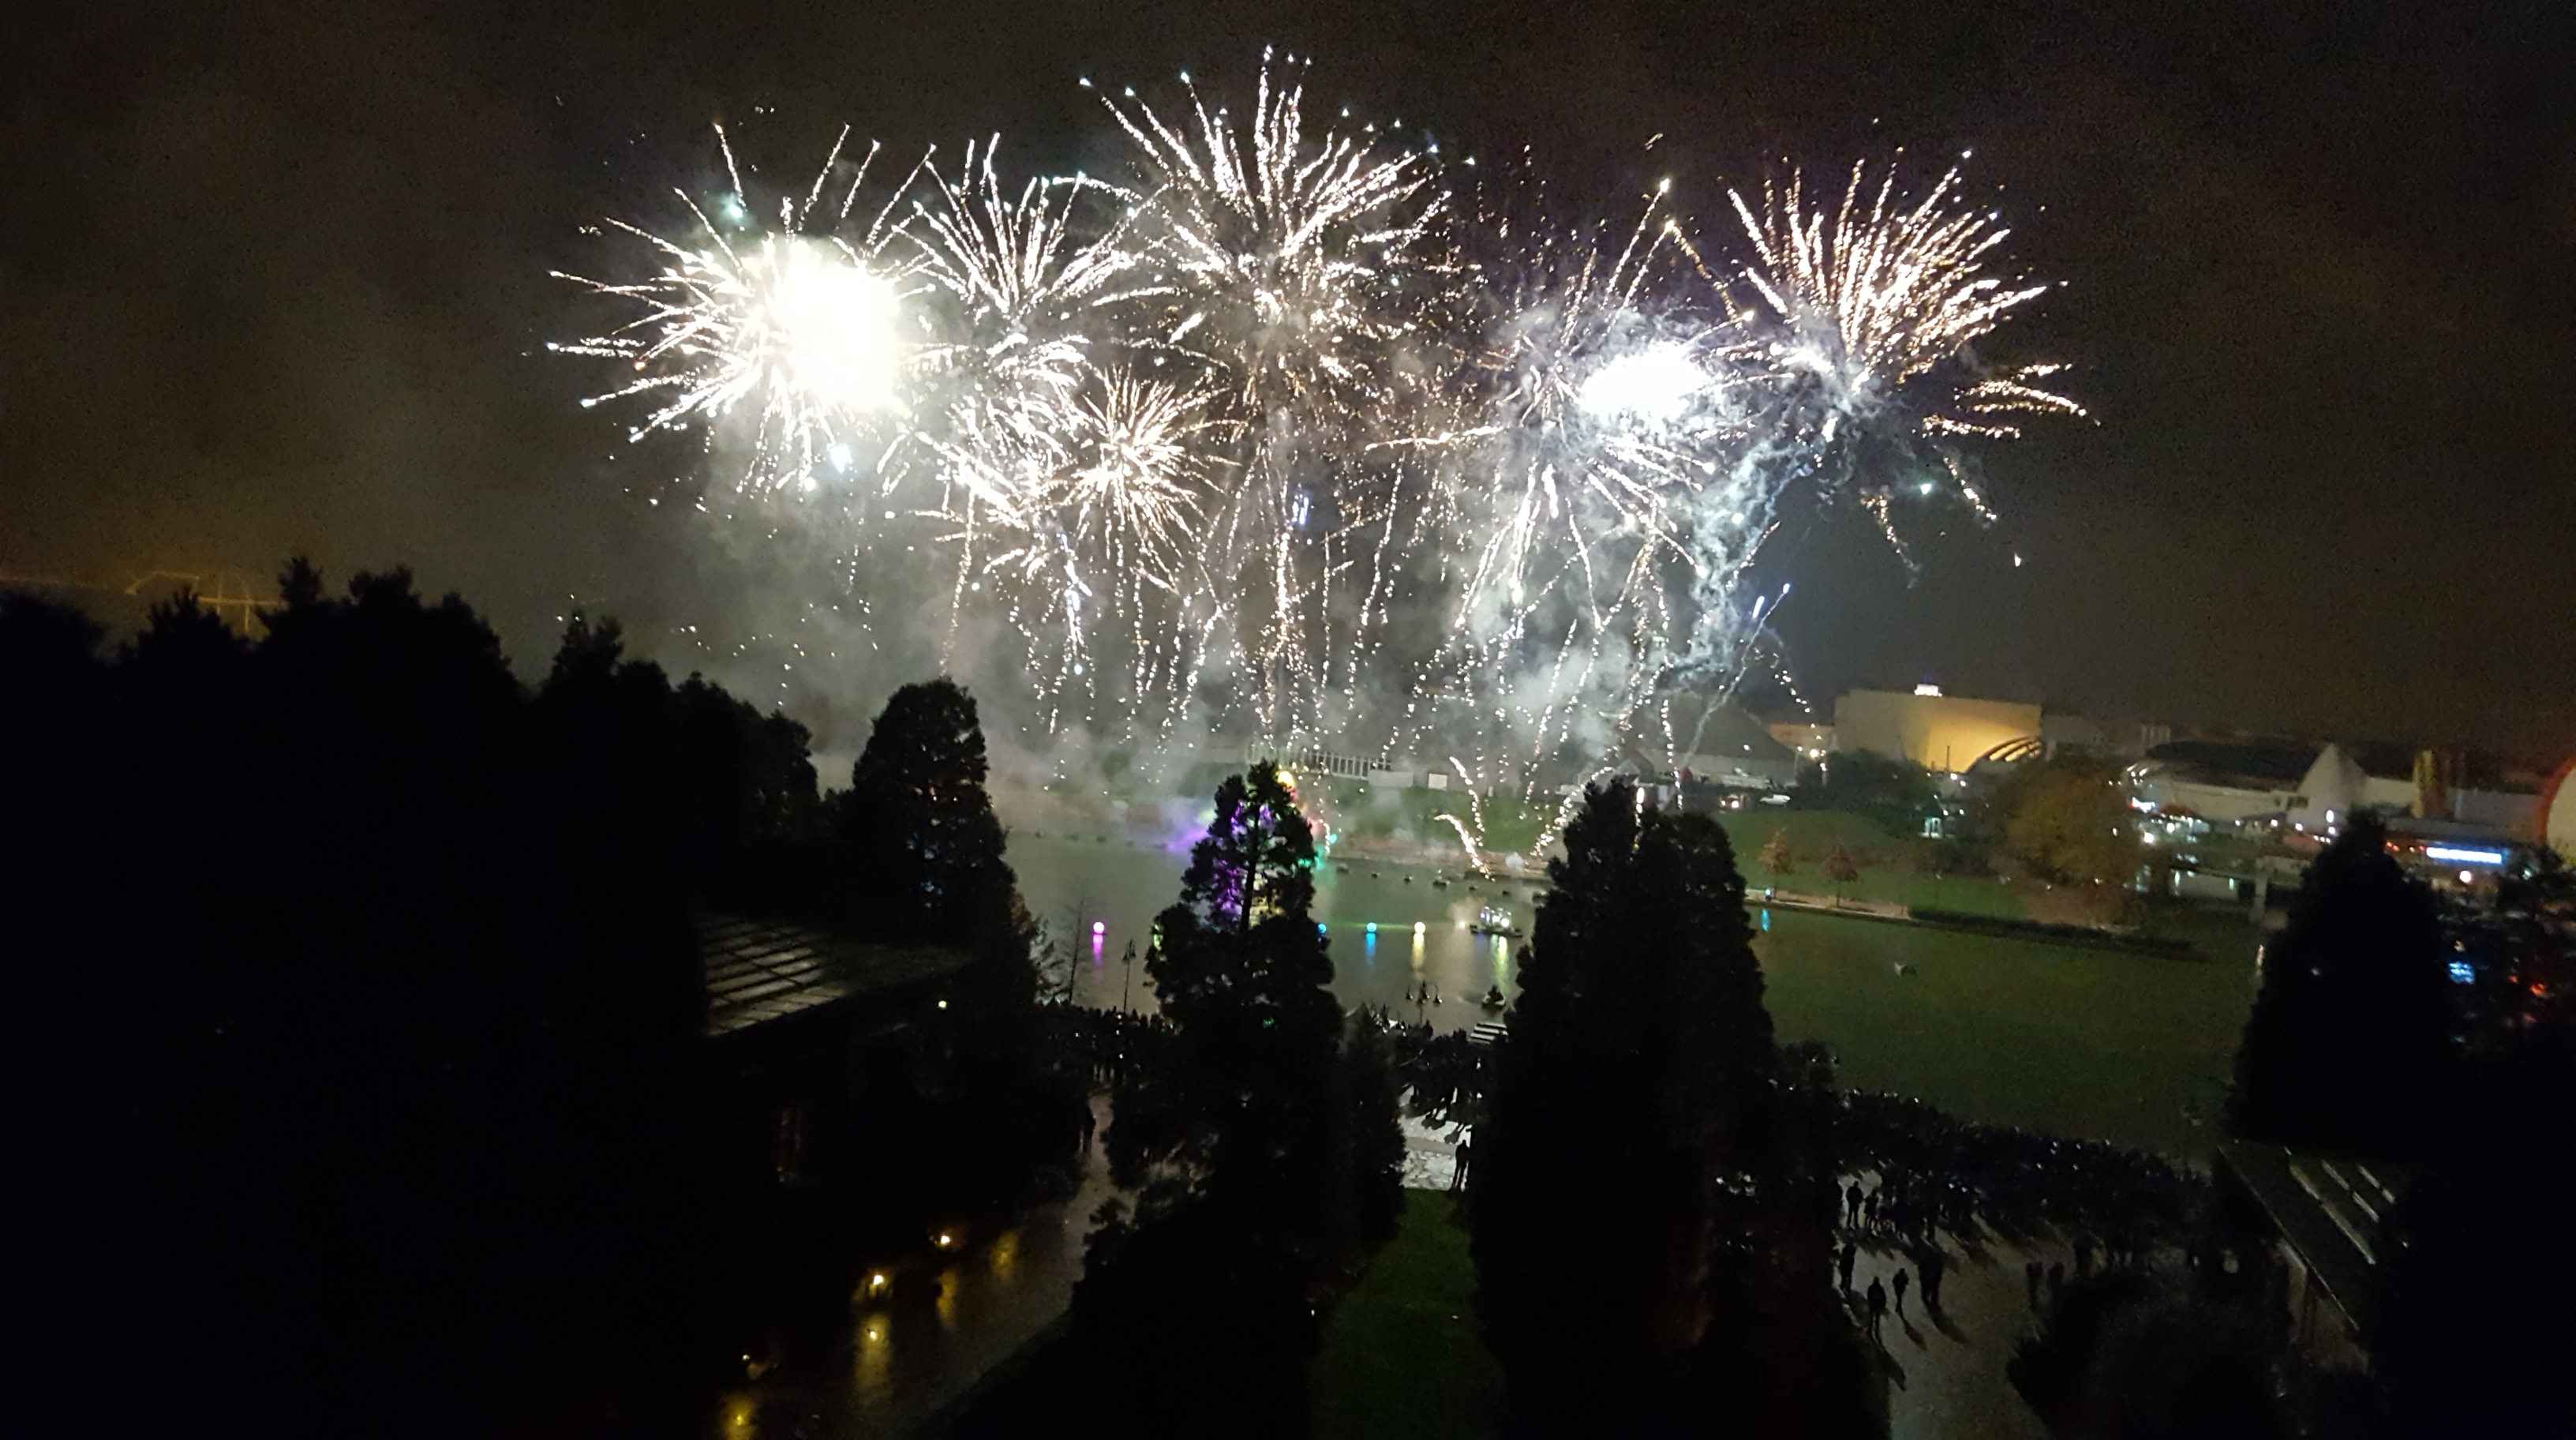 Fireworks from Disney's Sequoia Lodge in Disneyland Paris